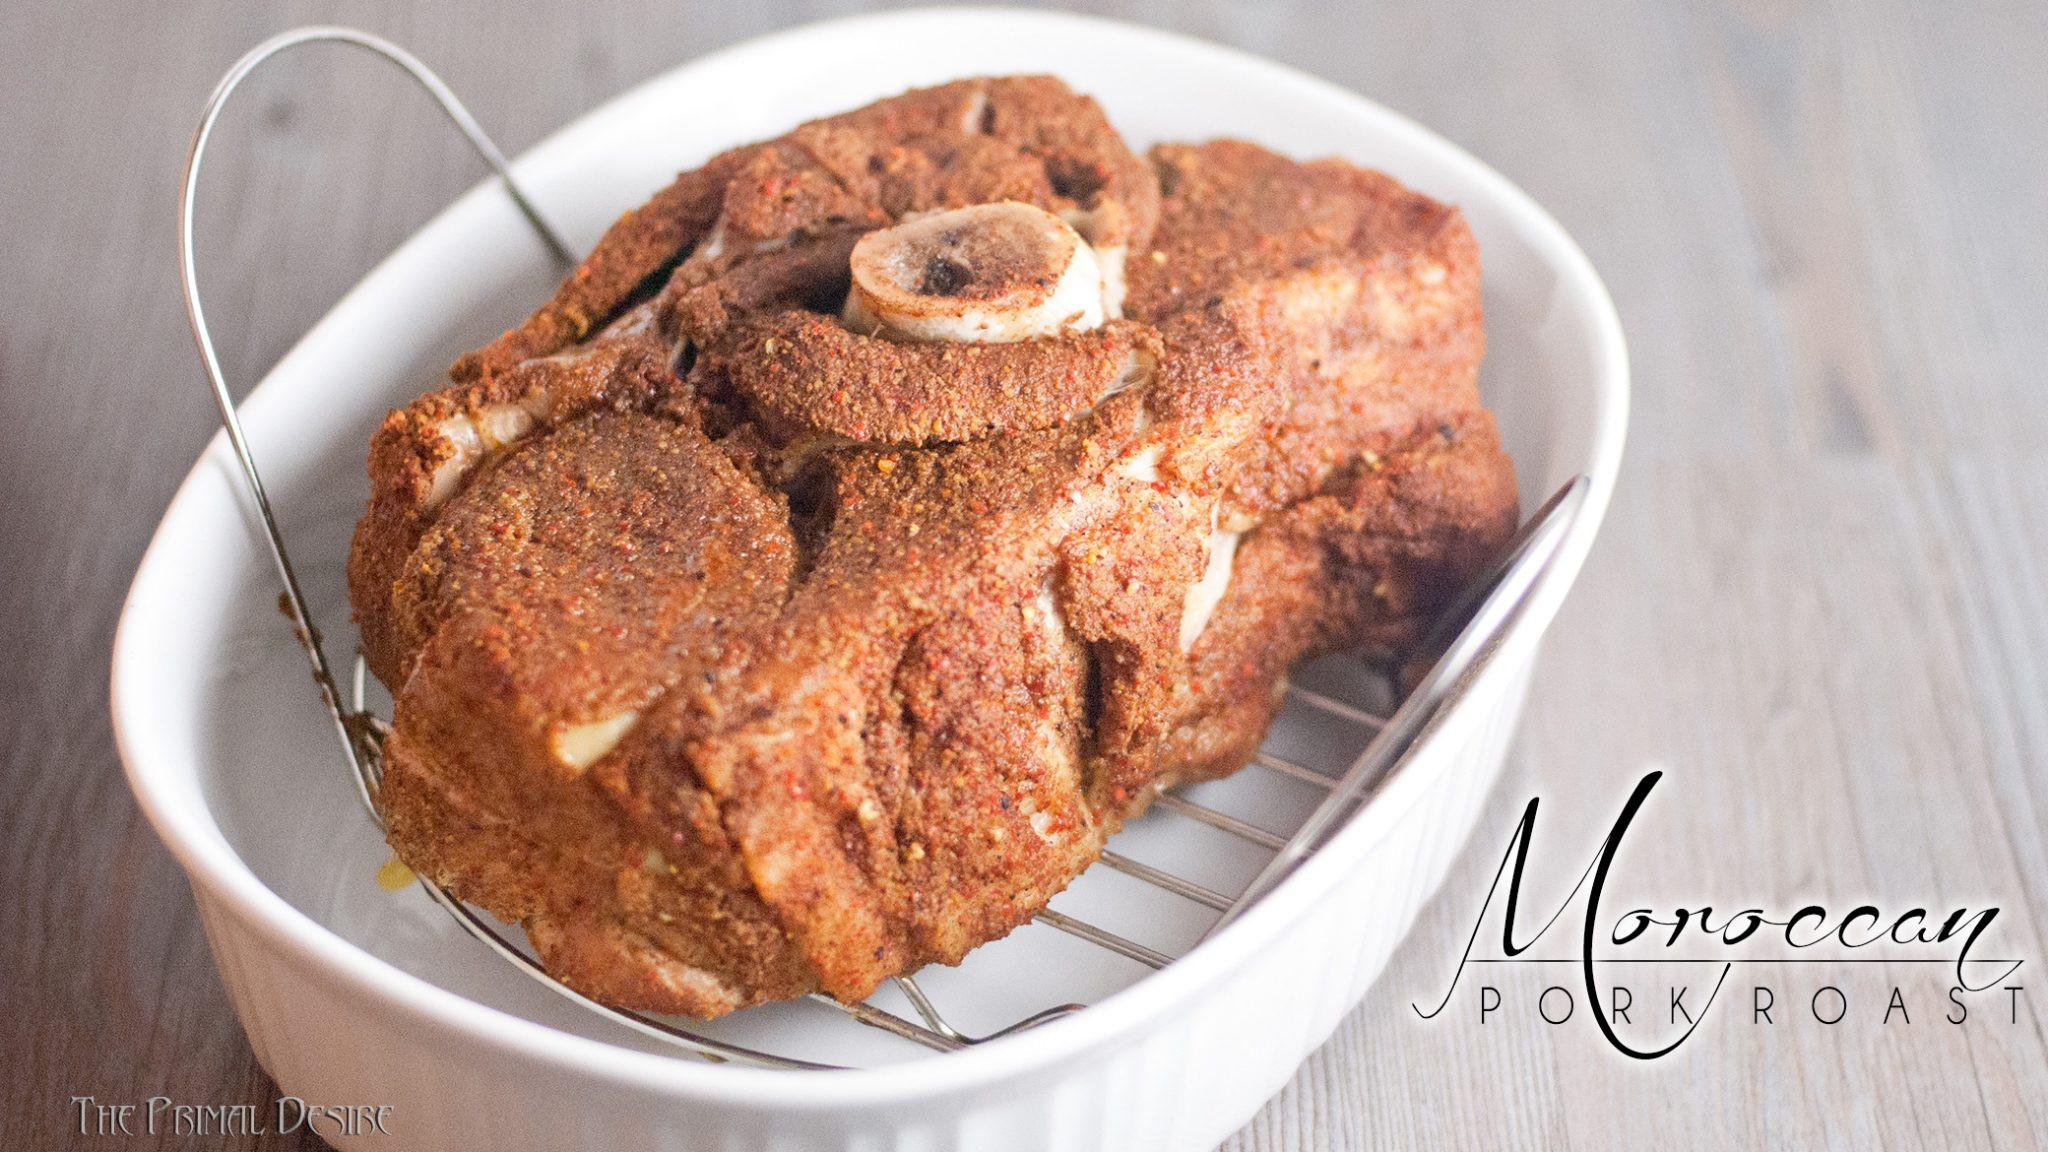 Pork Loin Instant Pot Paleo  Paleo Moroccan Pork Roast – Recipes InstantPot